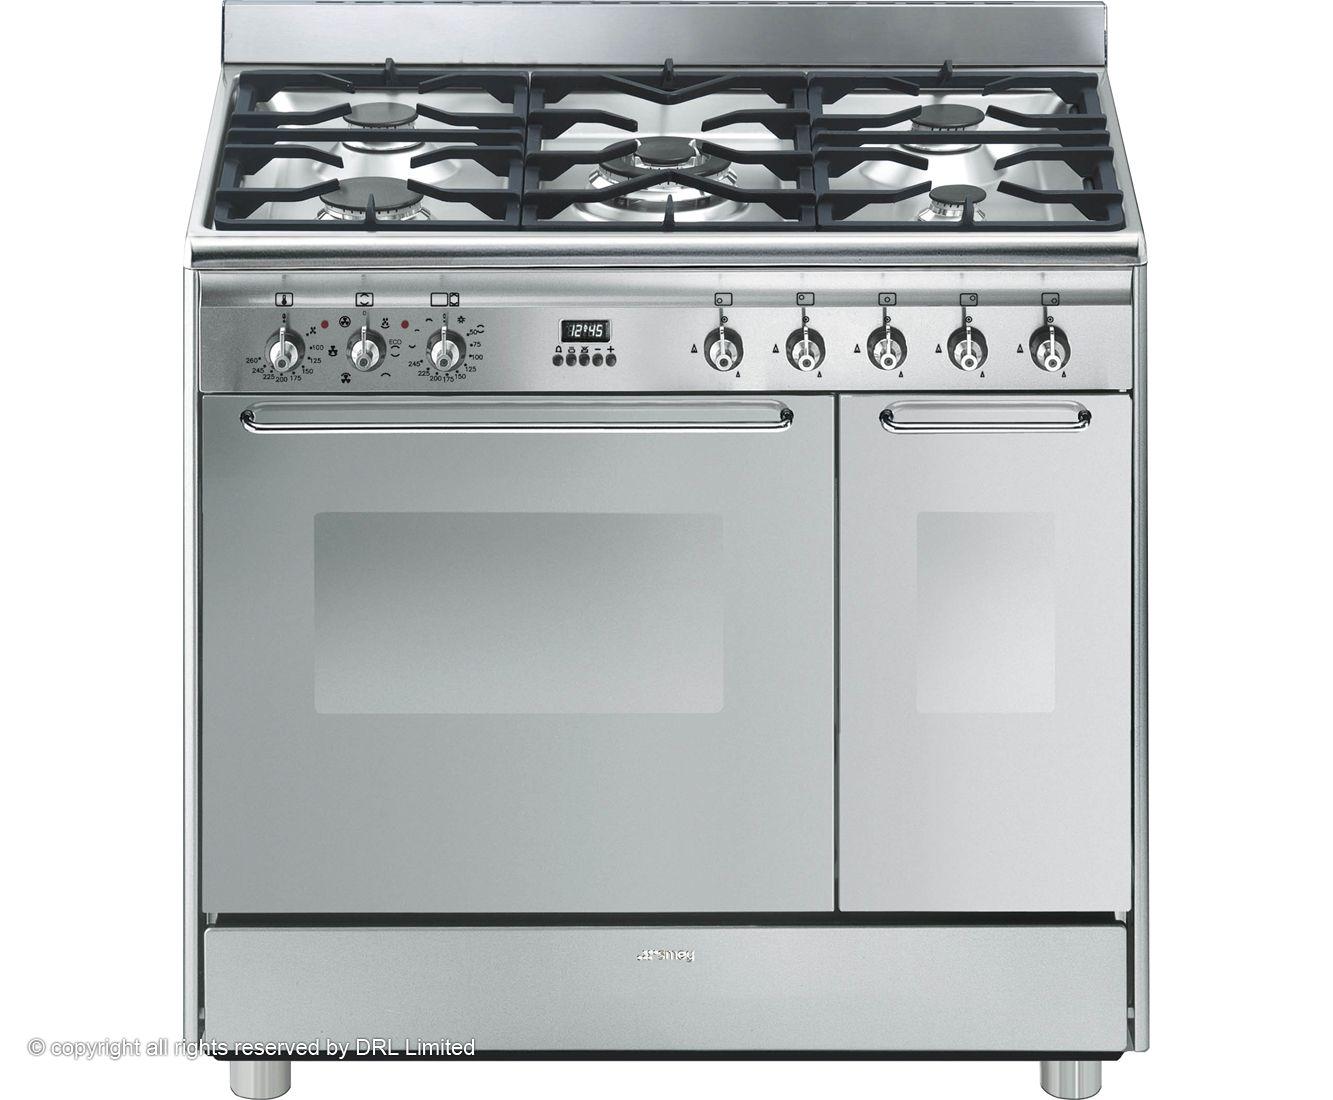 Smeg Cg92x9 90cm Dual Fuel Range Cooker Stainless Steel A A Rated Range Cooker Dual Fuel Range Cookers Cooker